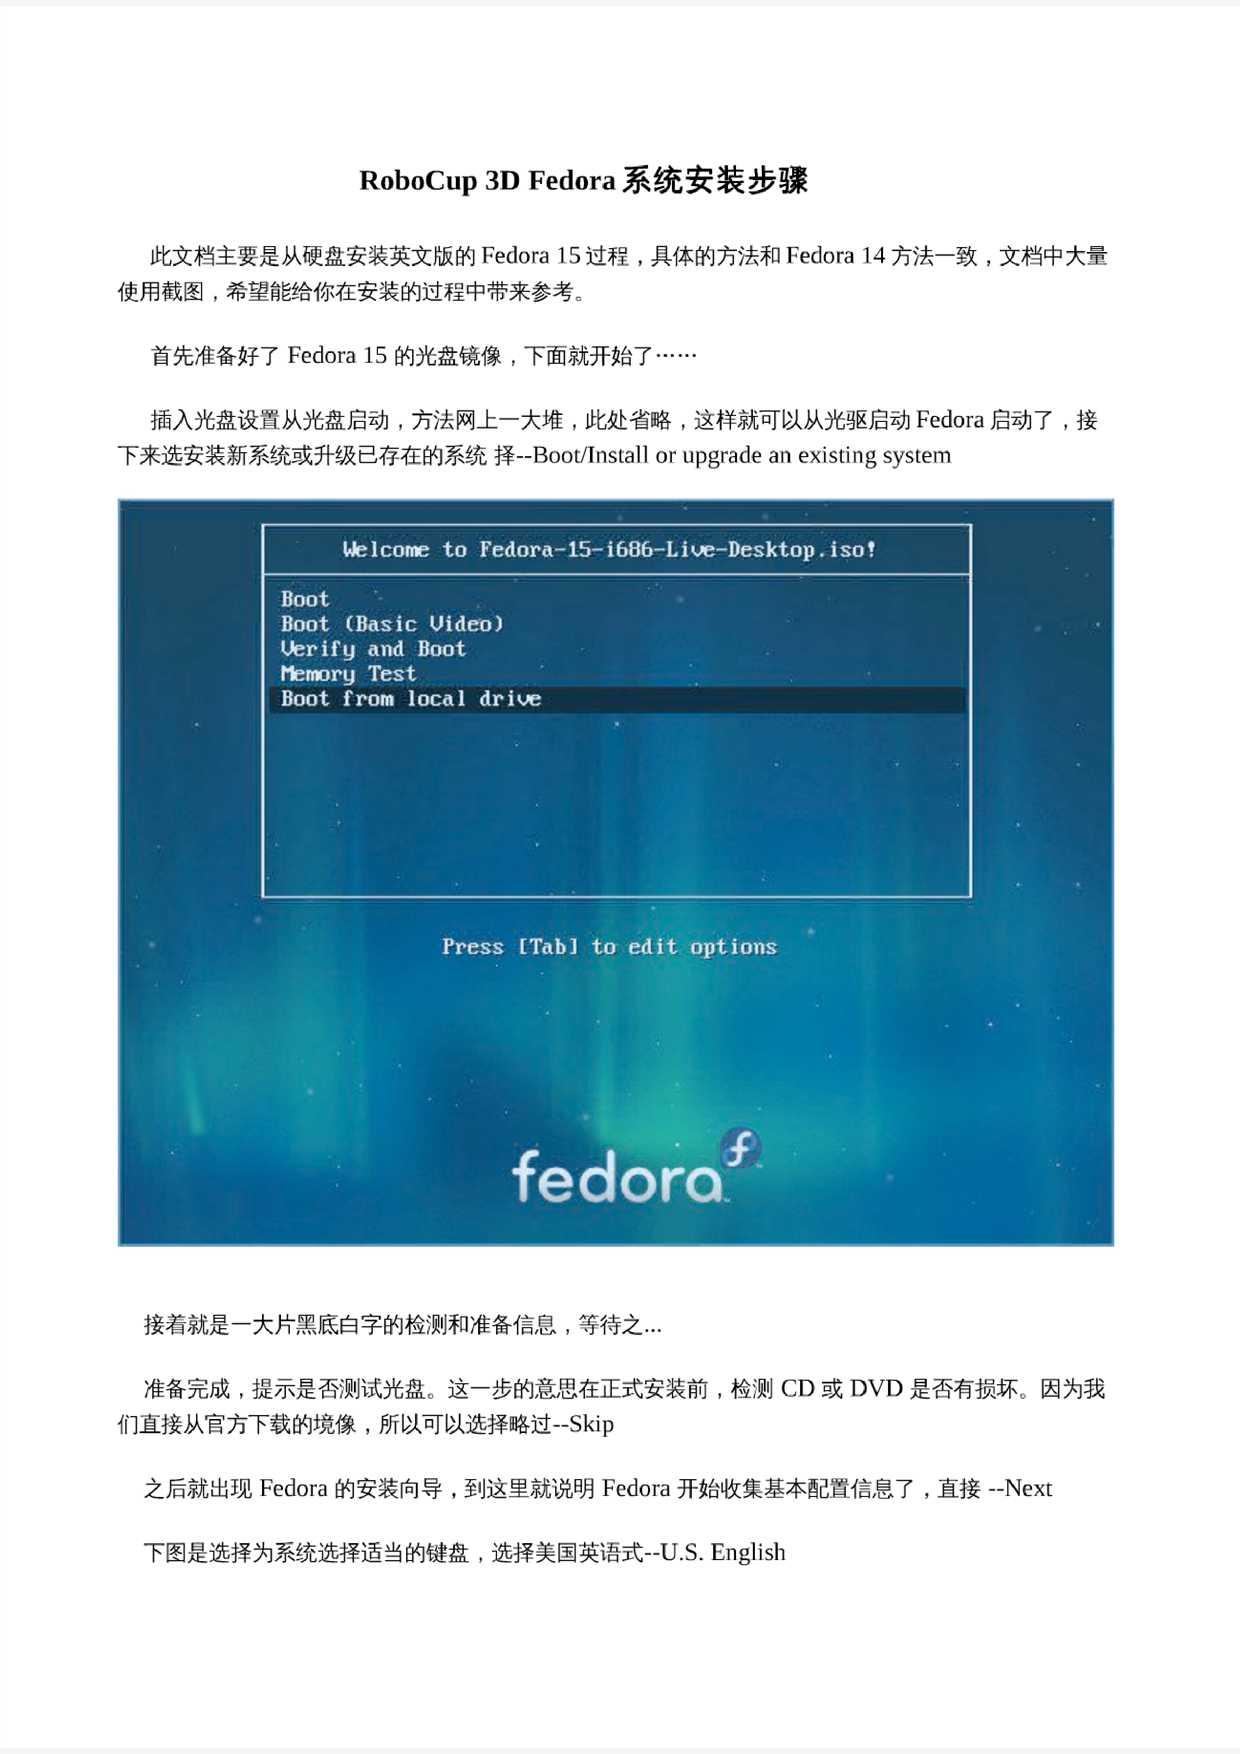 robocup 3d fedora系统安装步骤